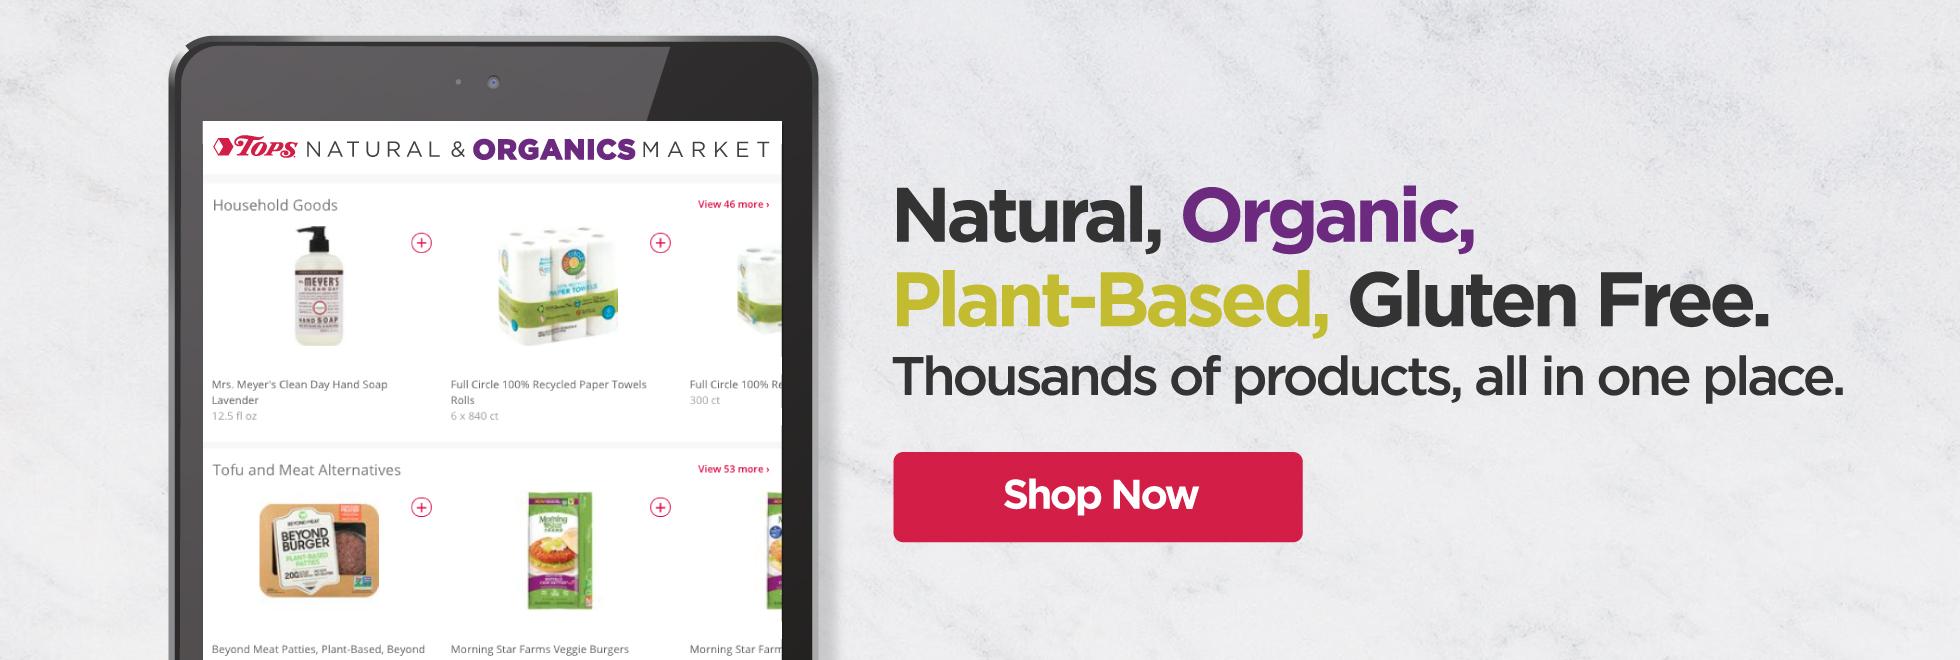 Tops Natural and Organics Market